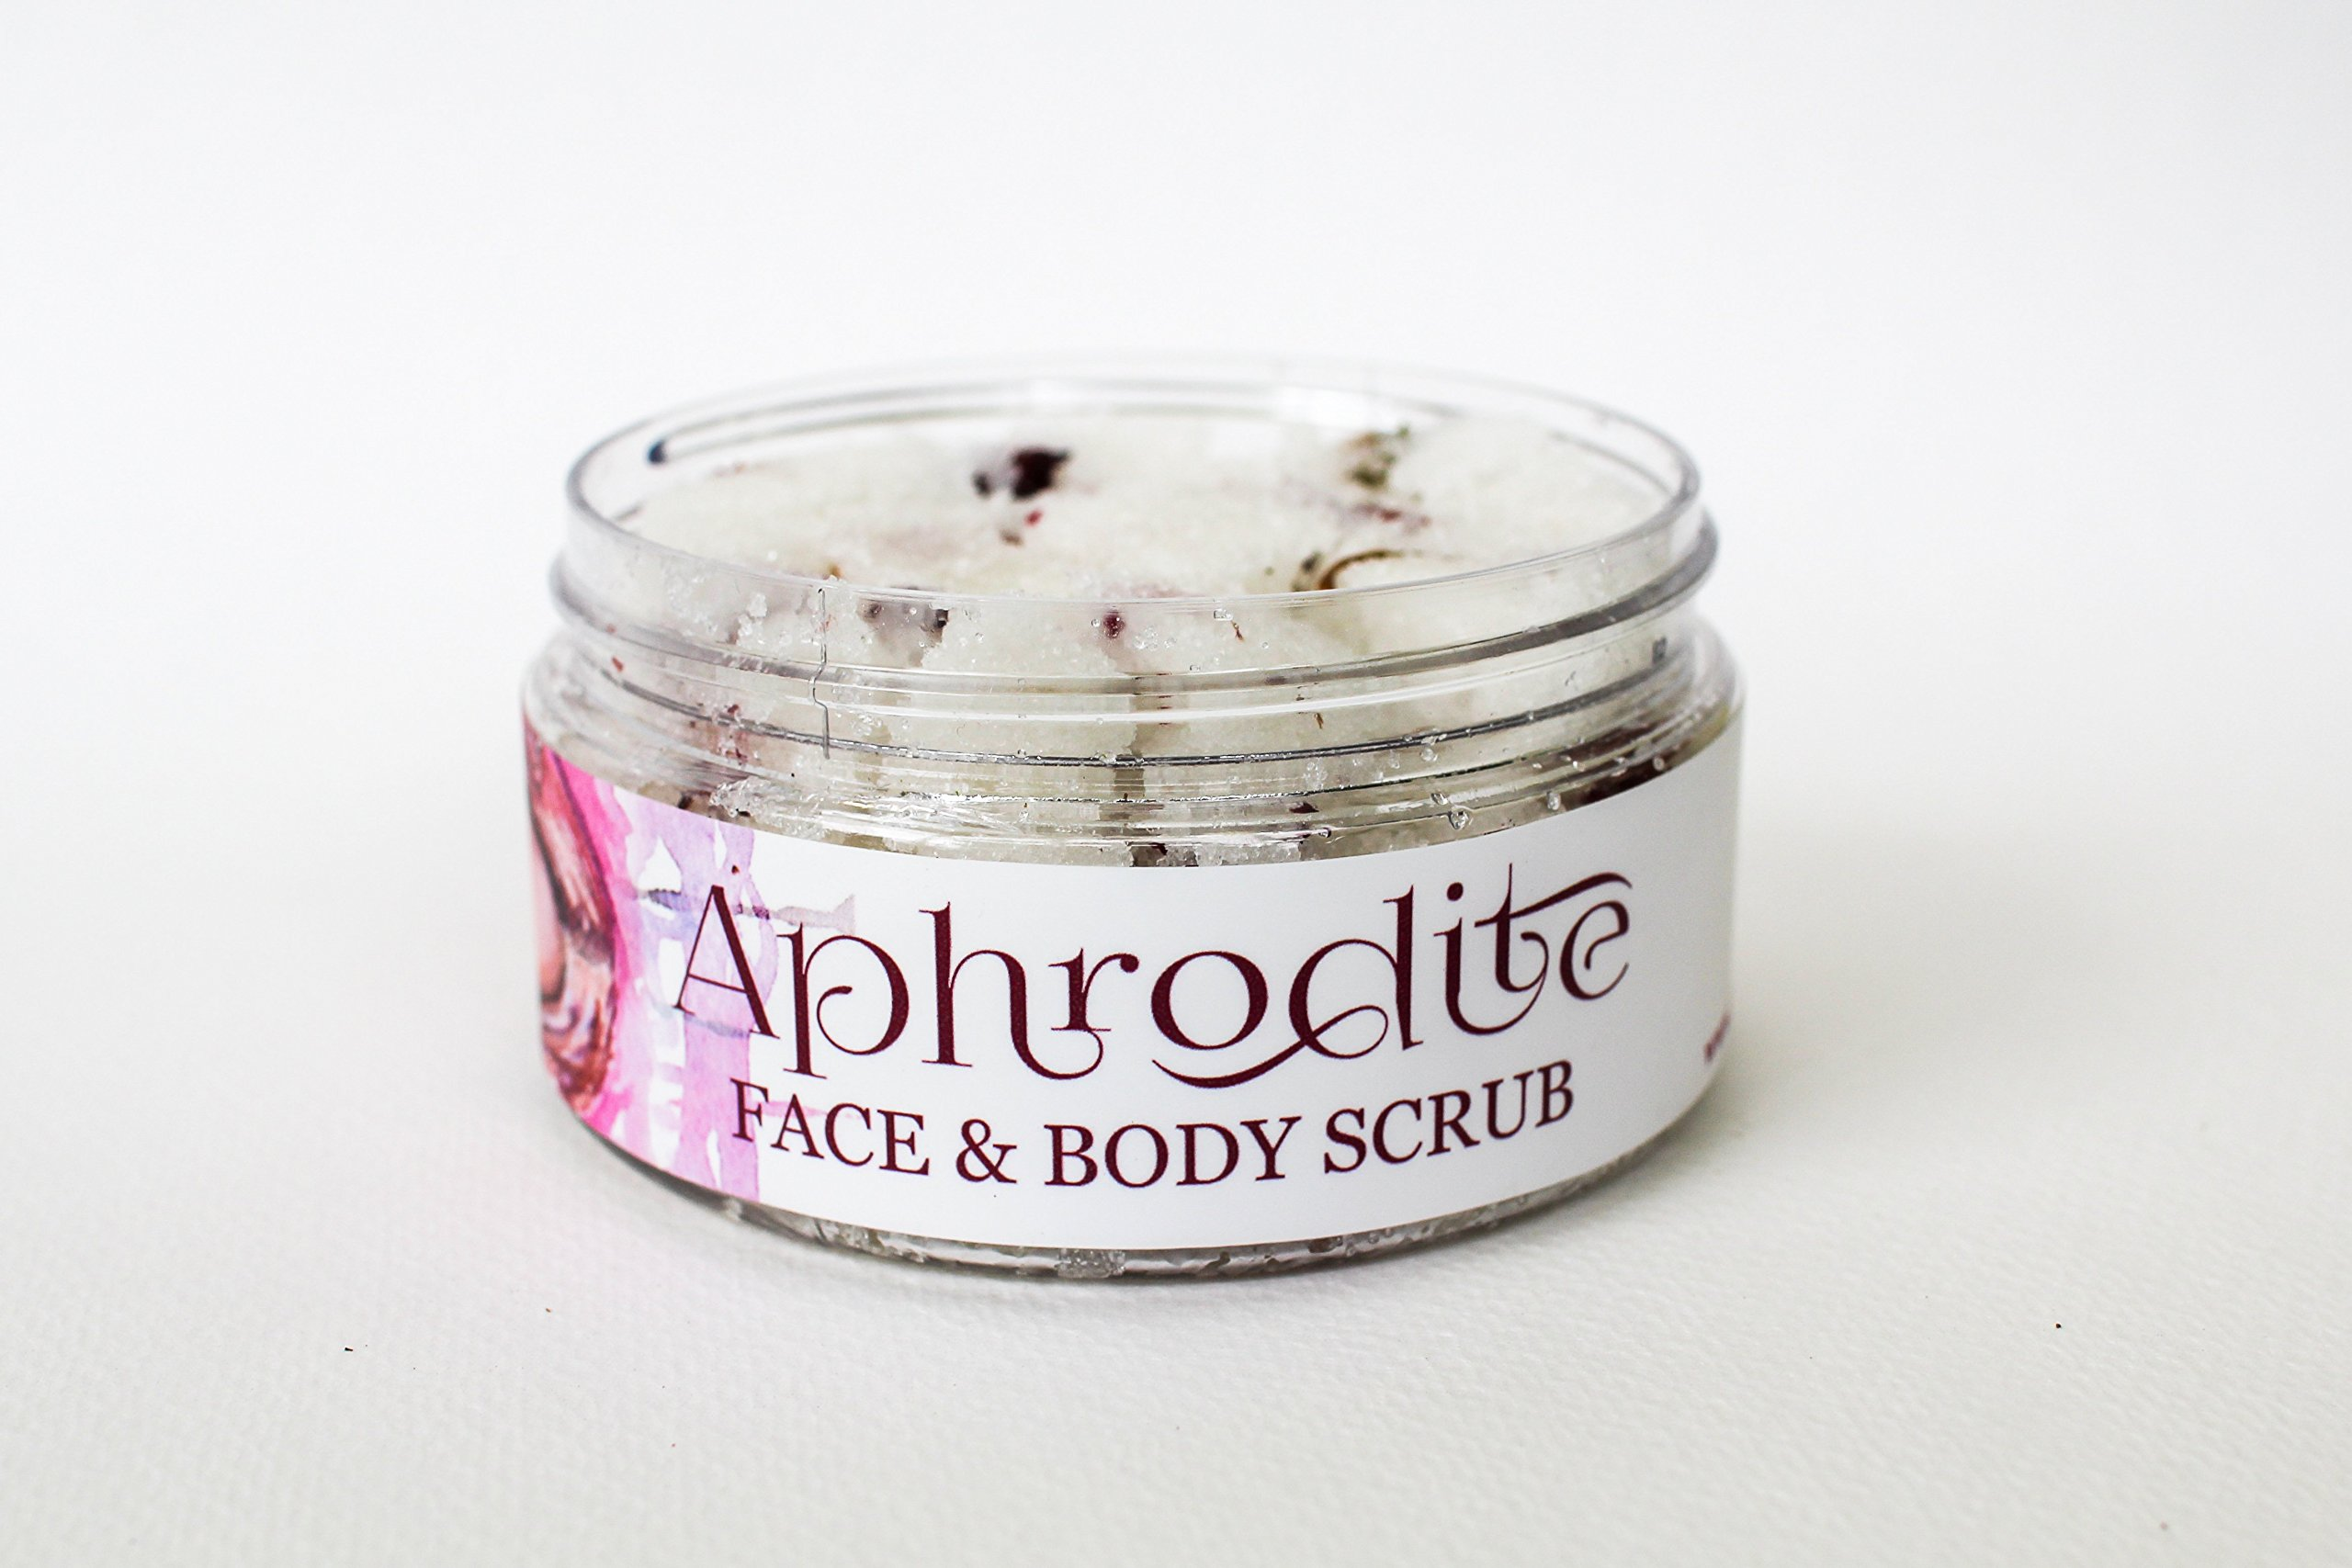 Aphrodite Face & Body Scrub